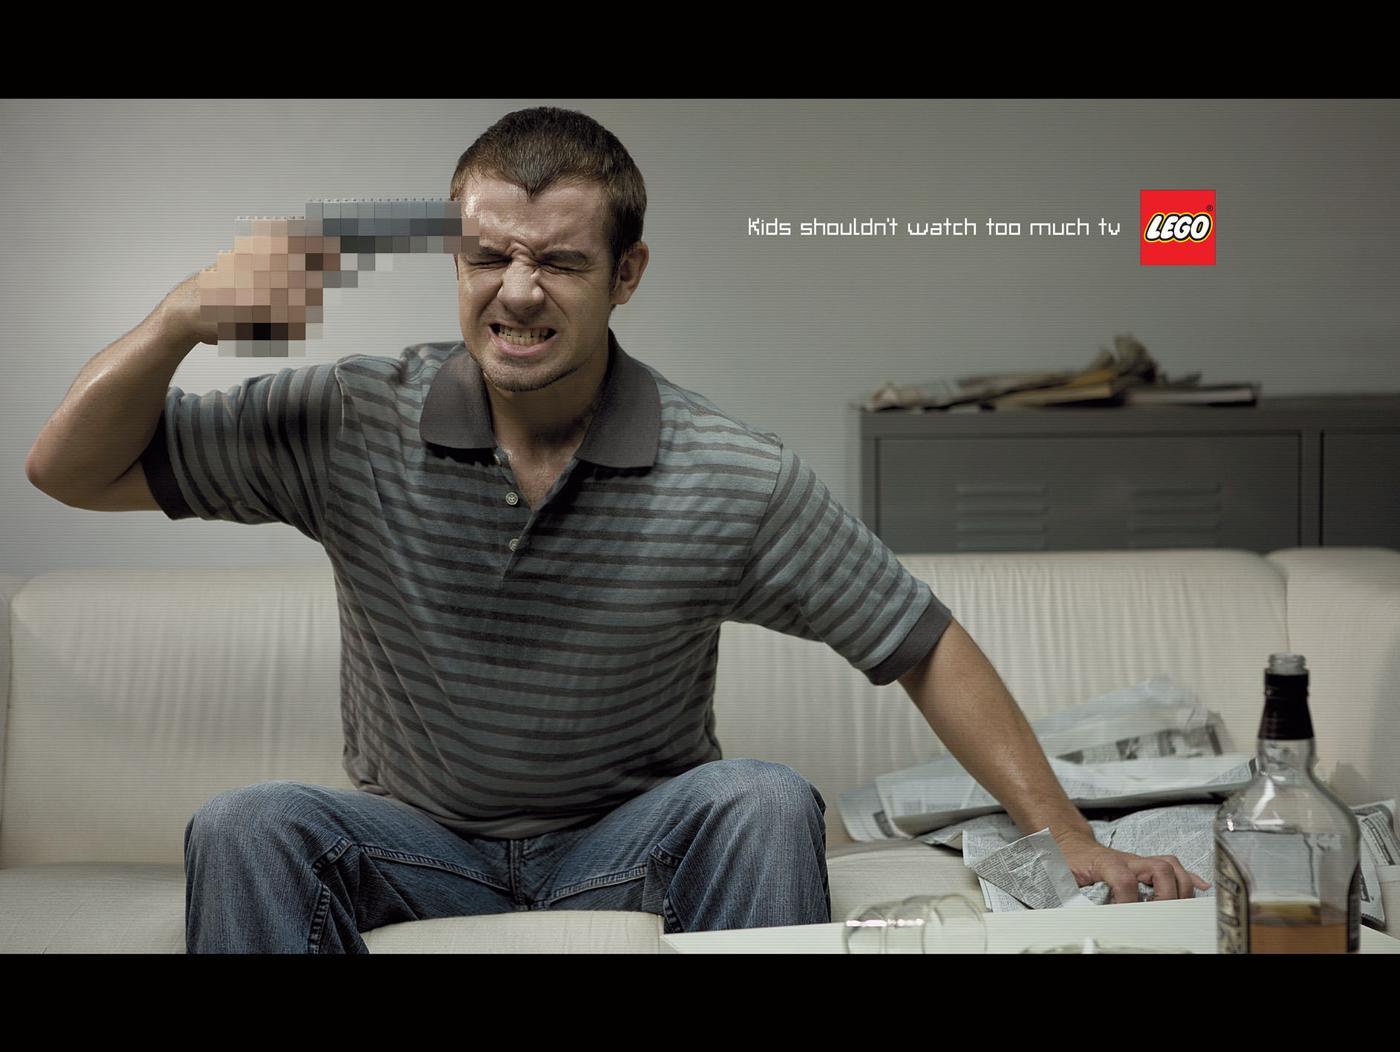 kids watching tv violence. lego print ad - violence kids watching tv